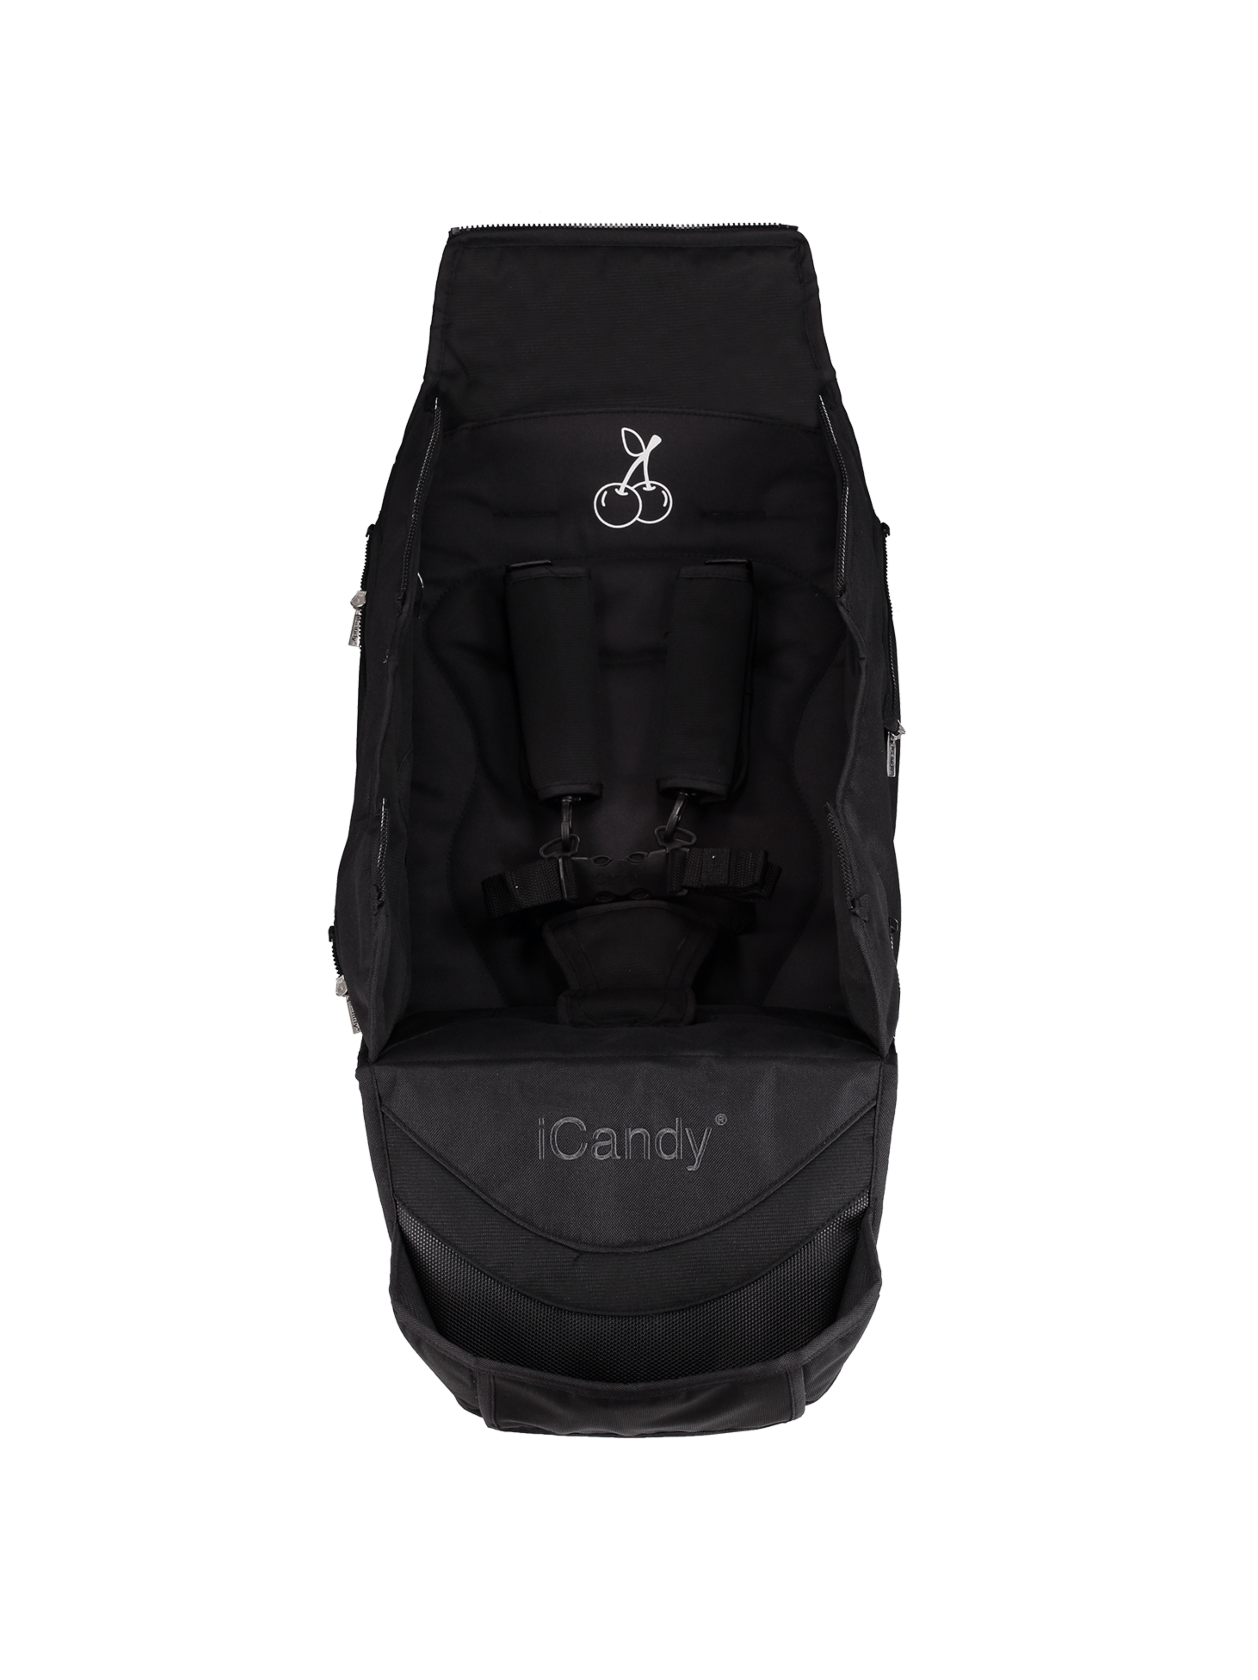 Cherry Seat Unit Fabric Black